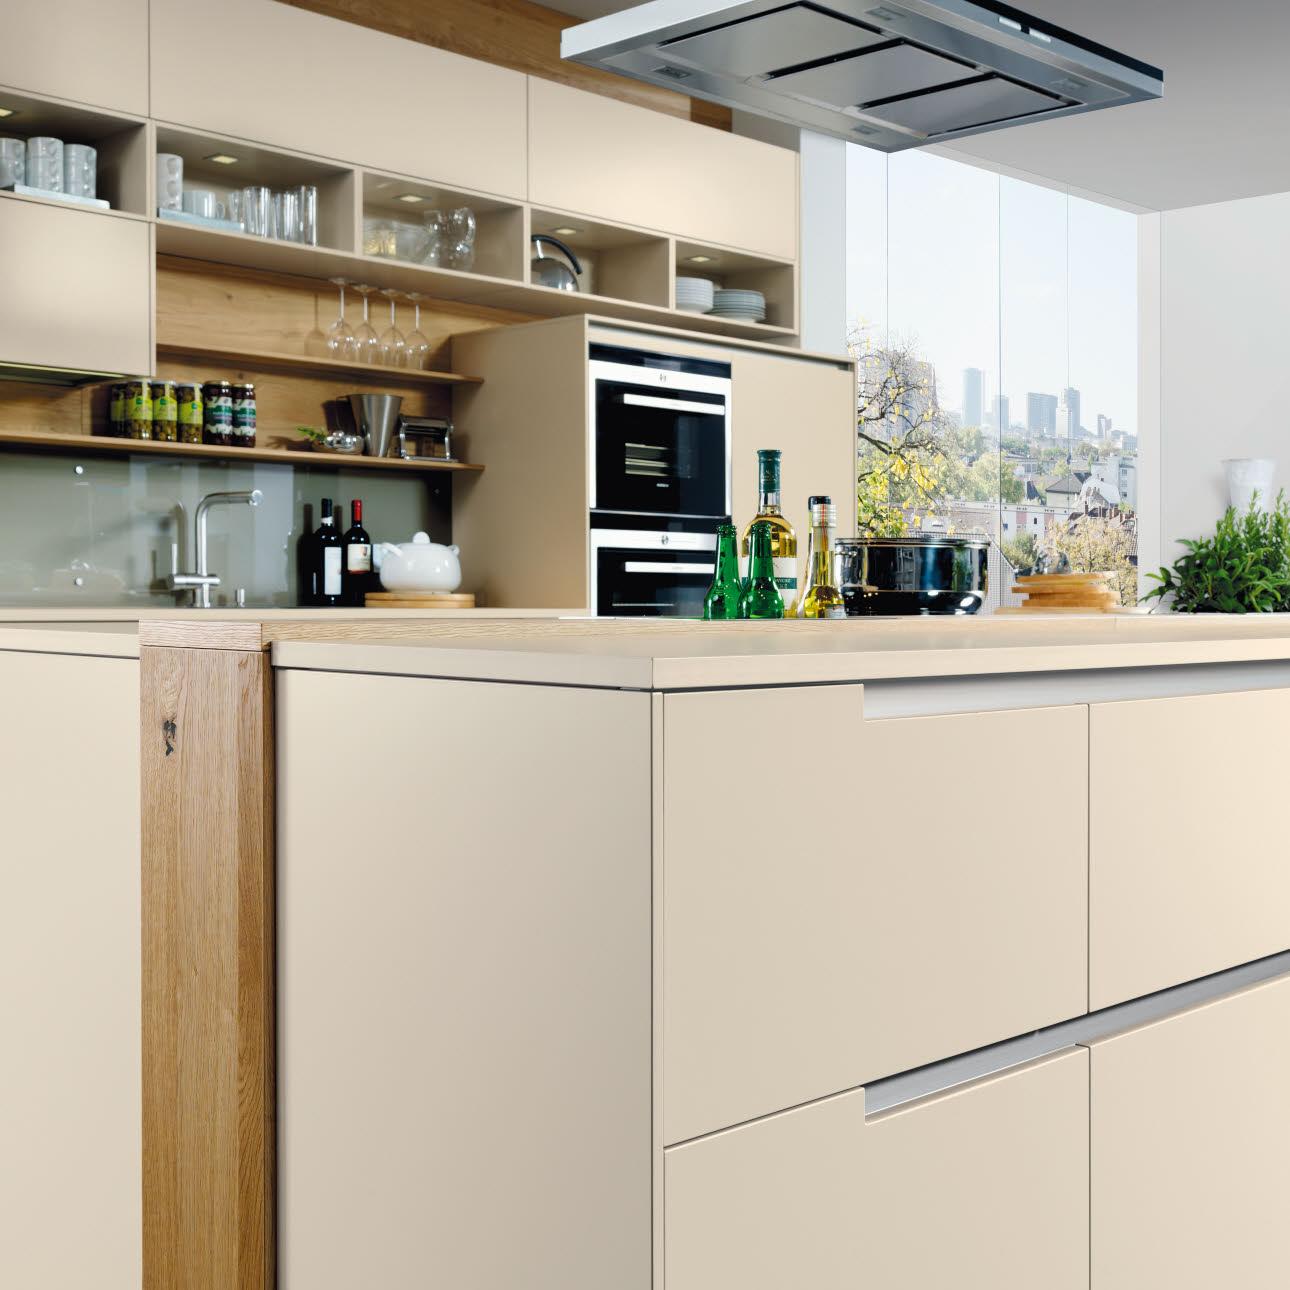 ewe Küchen I Magazin I Edles griffloses Küchendesign mit ...